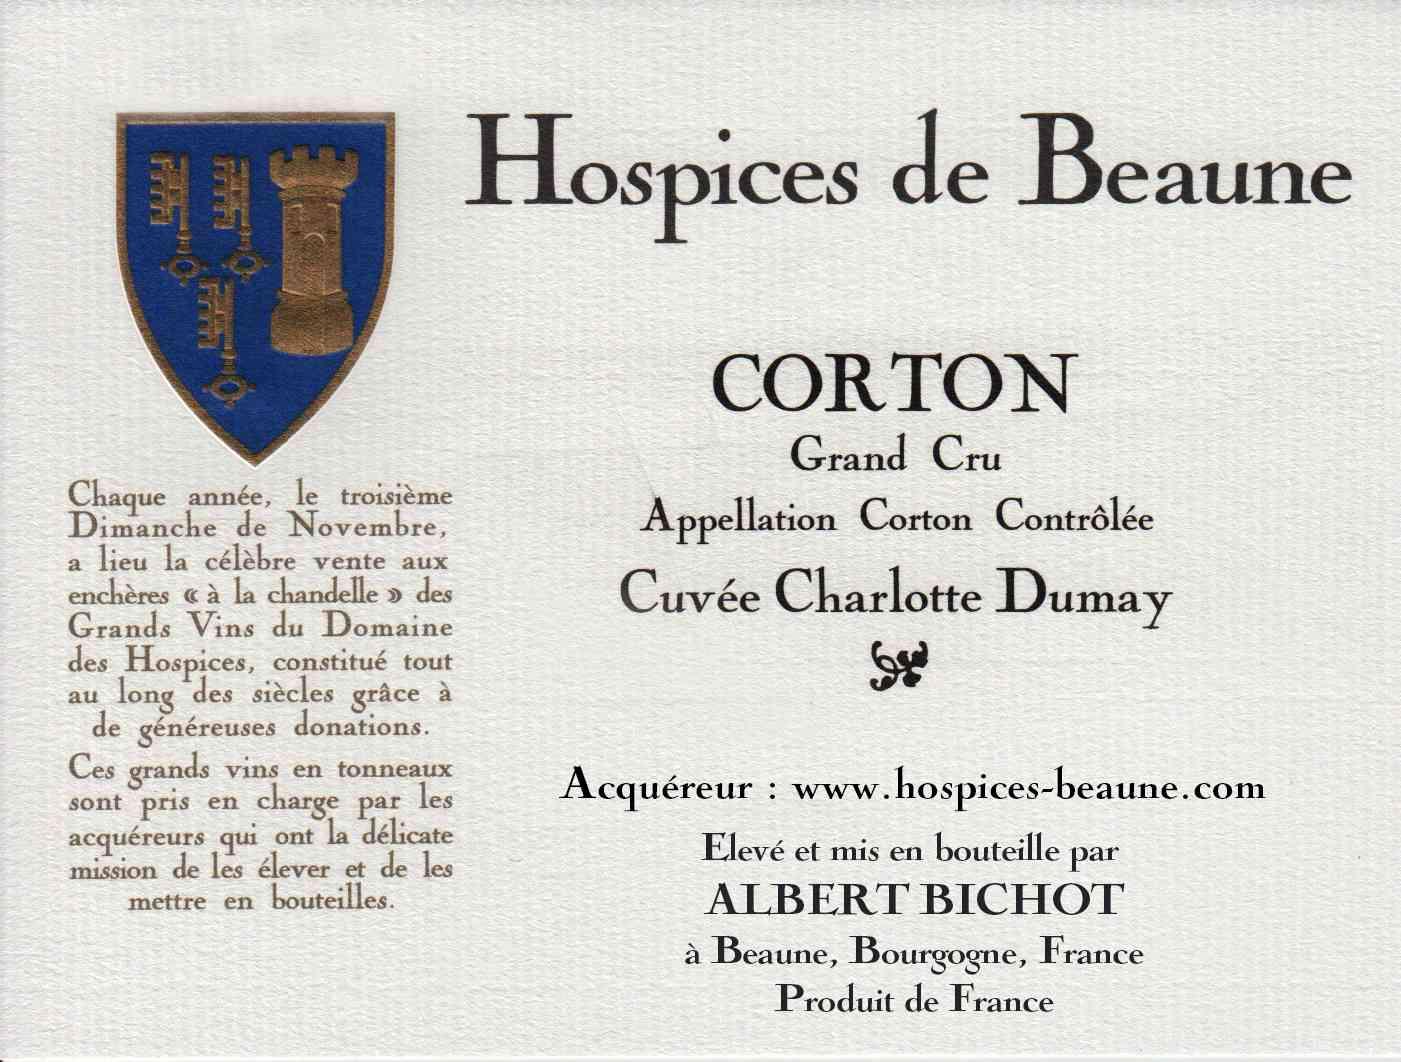 Encheres-auction-HospicesdeBeaune-AlbertBichot-CortonGrandCru-Cuvee-CharlotteDumay